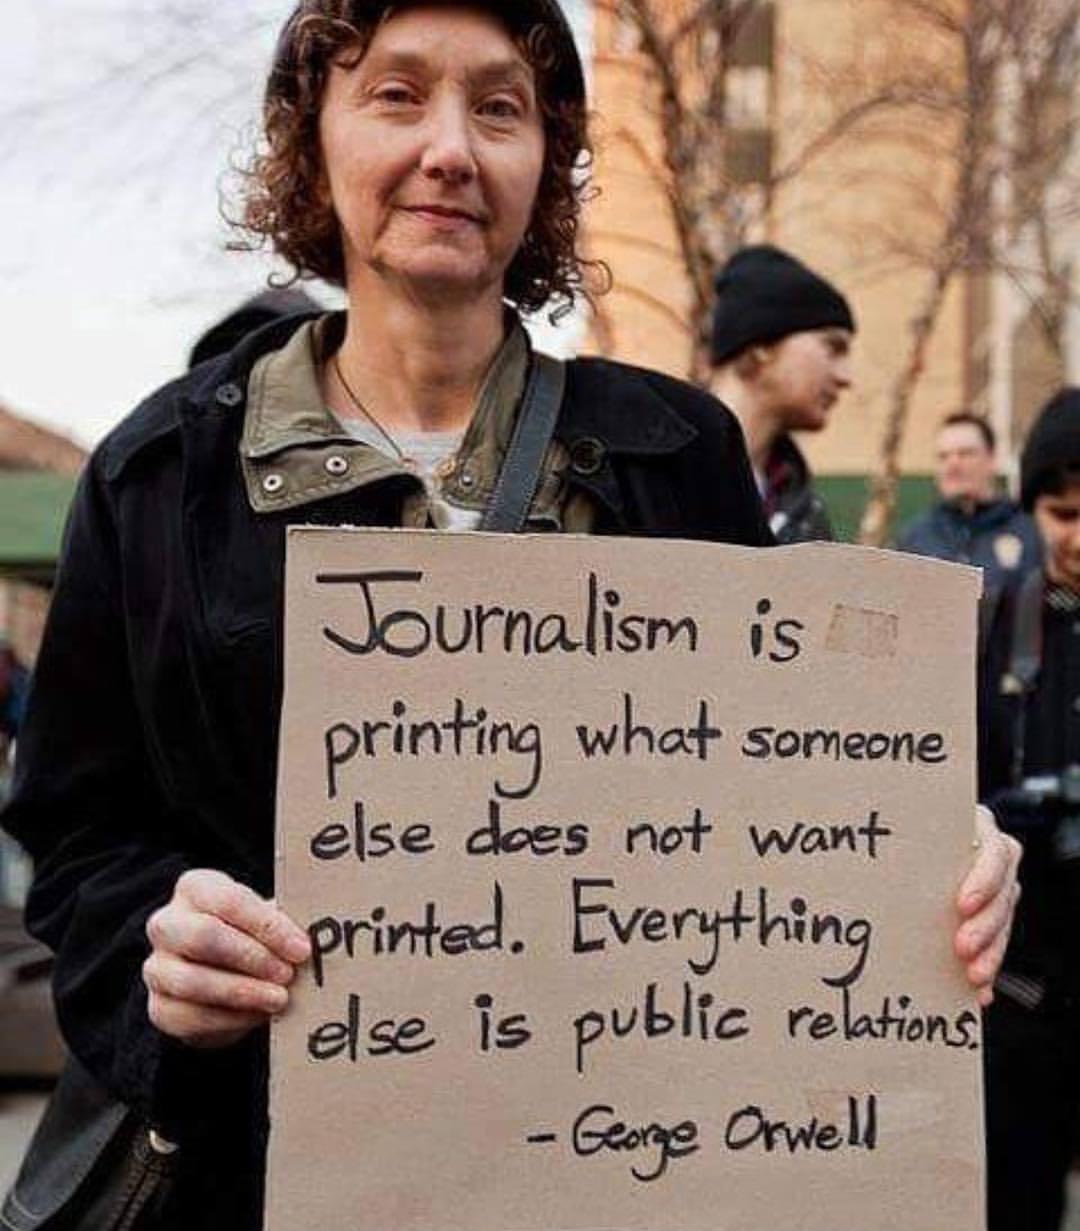 #democracydiesindarkness #allthenewsthatsfittoprint #guardianwitness #firstamendment